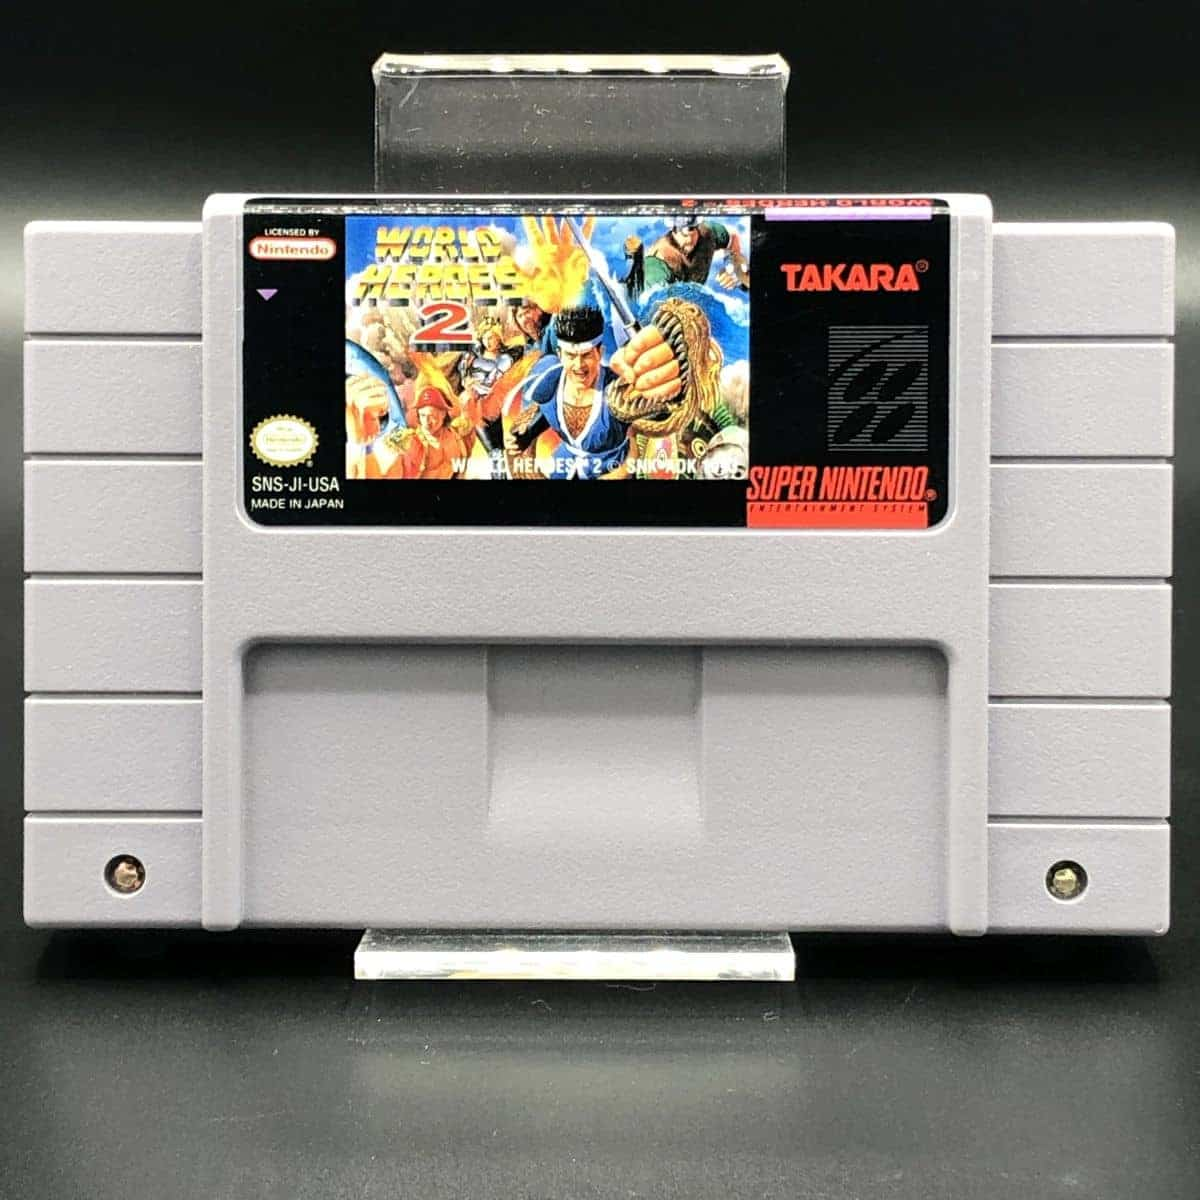 SNES World Heroes 2 (Import) (Modul) (Sehr gut) Super Nintendo